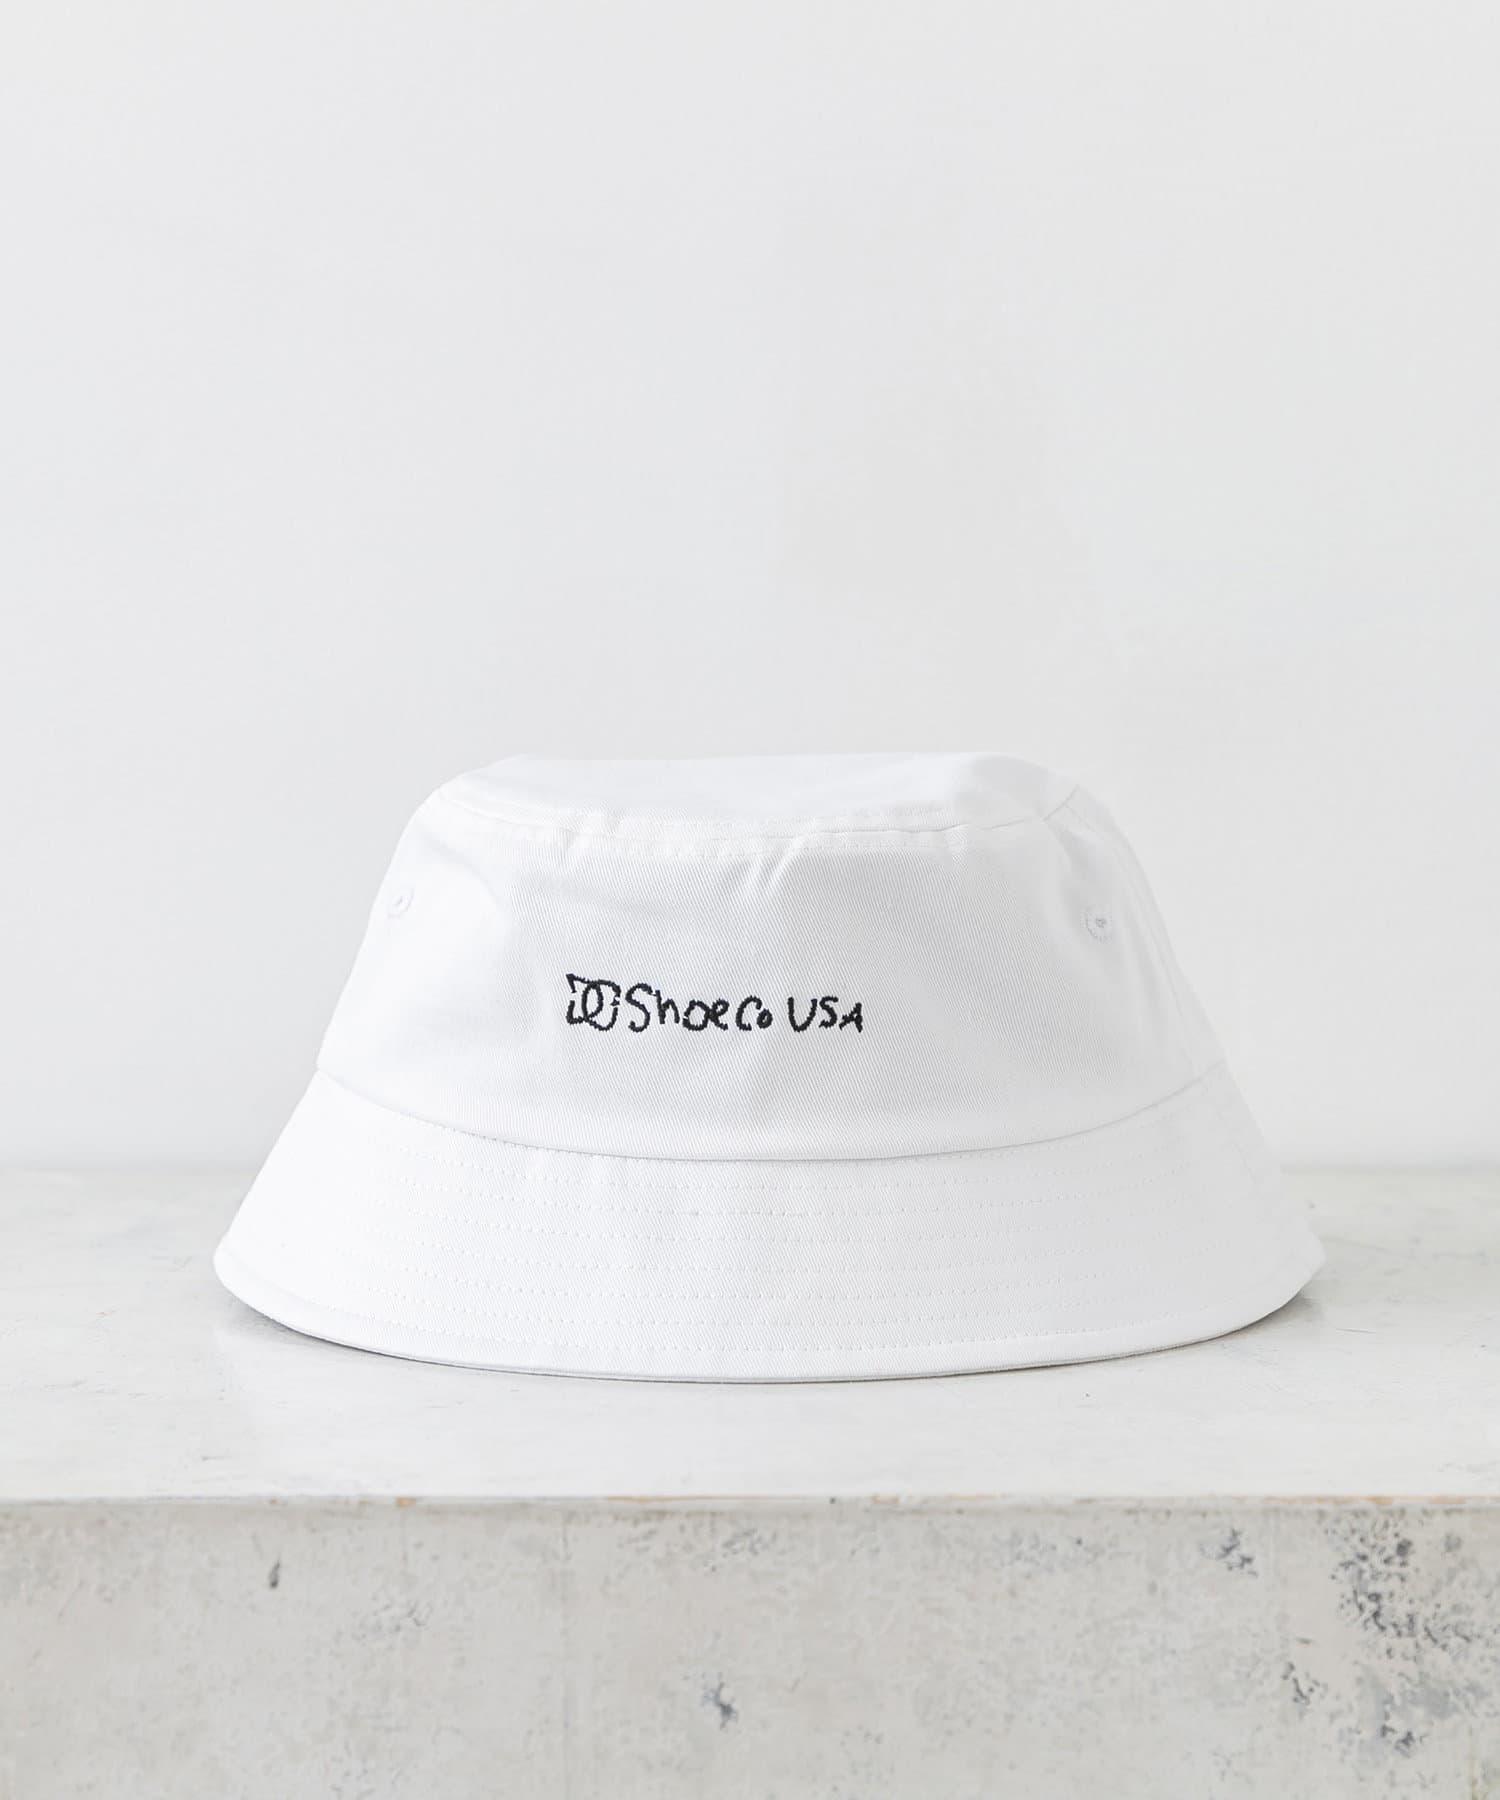 RASVOA(ラスボア) 【DC SHOES】 SKETCH HAT